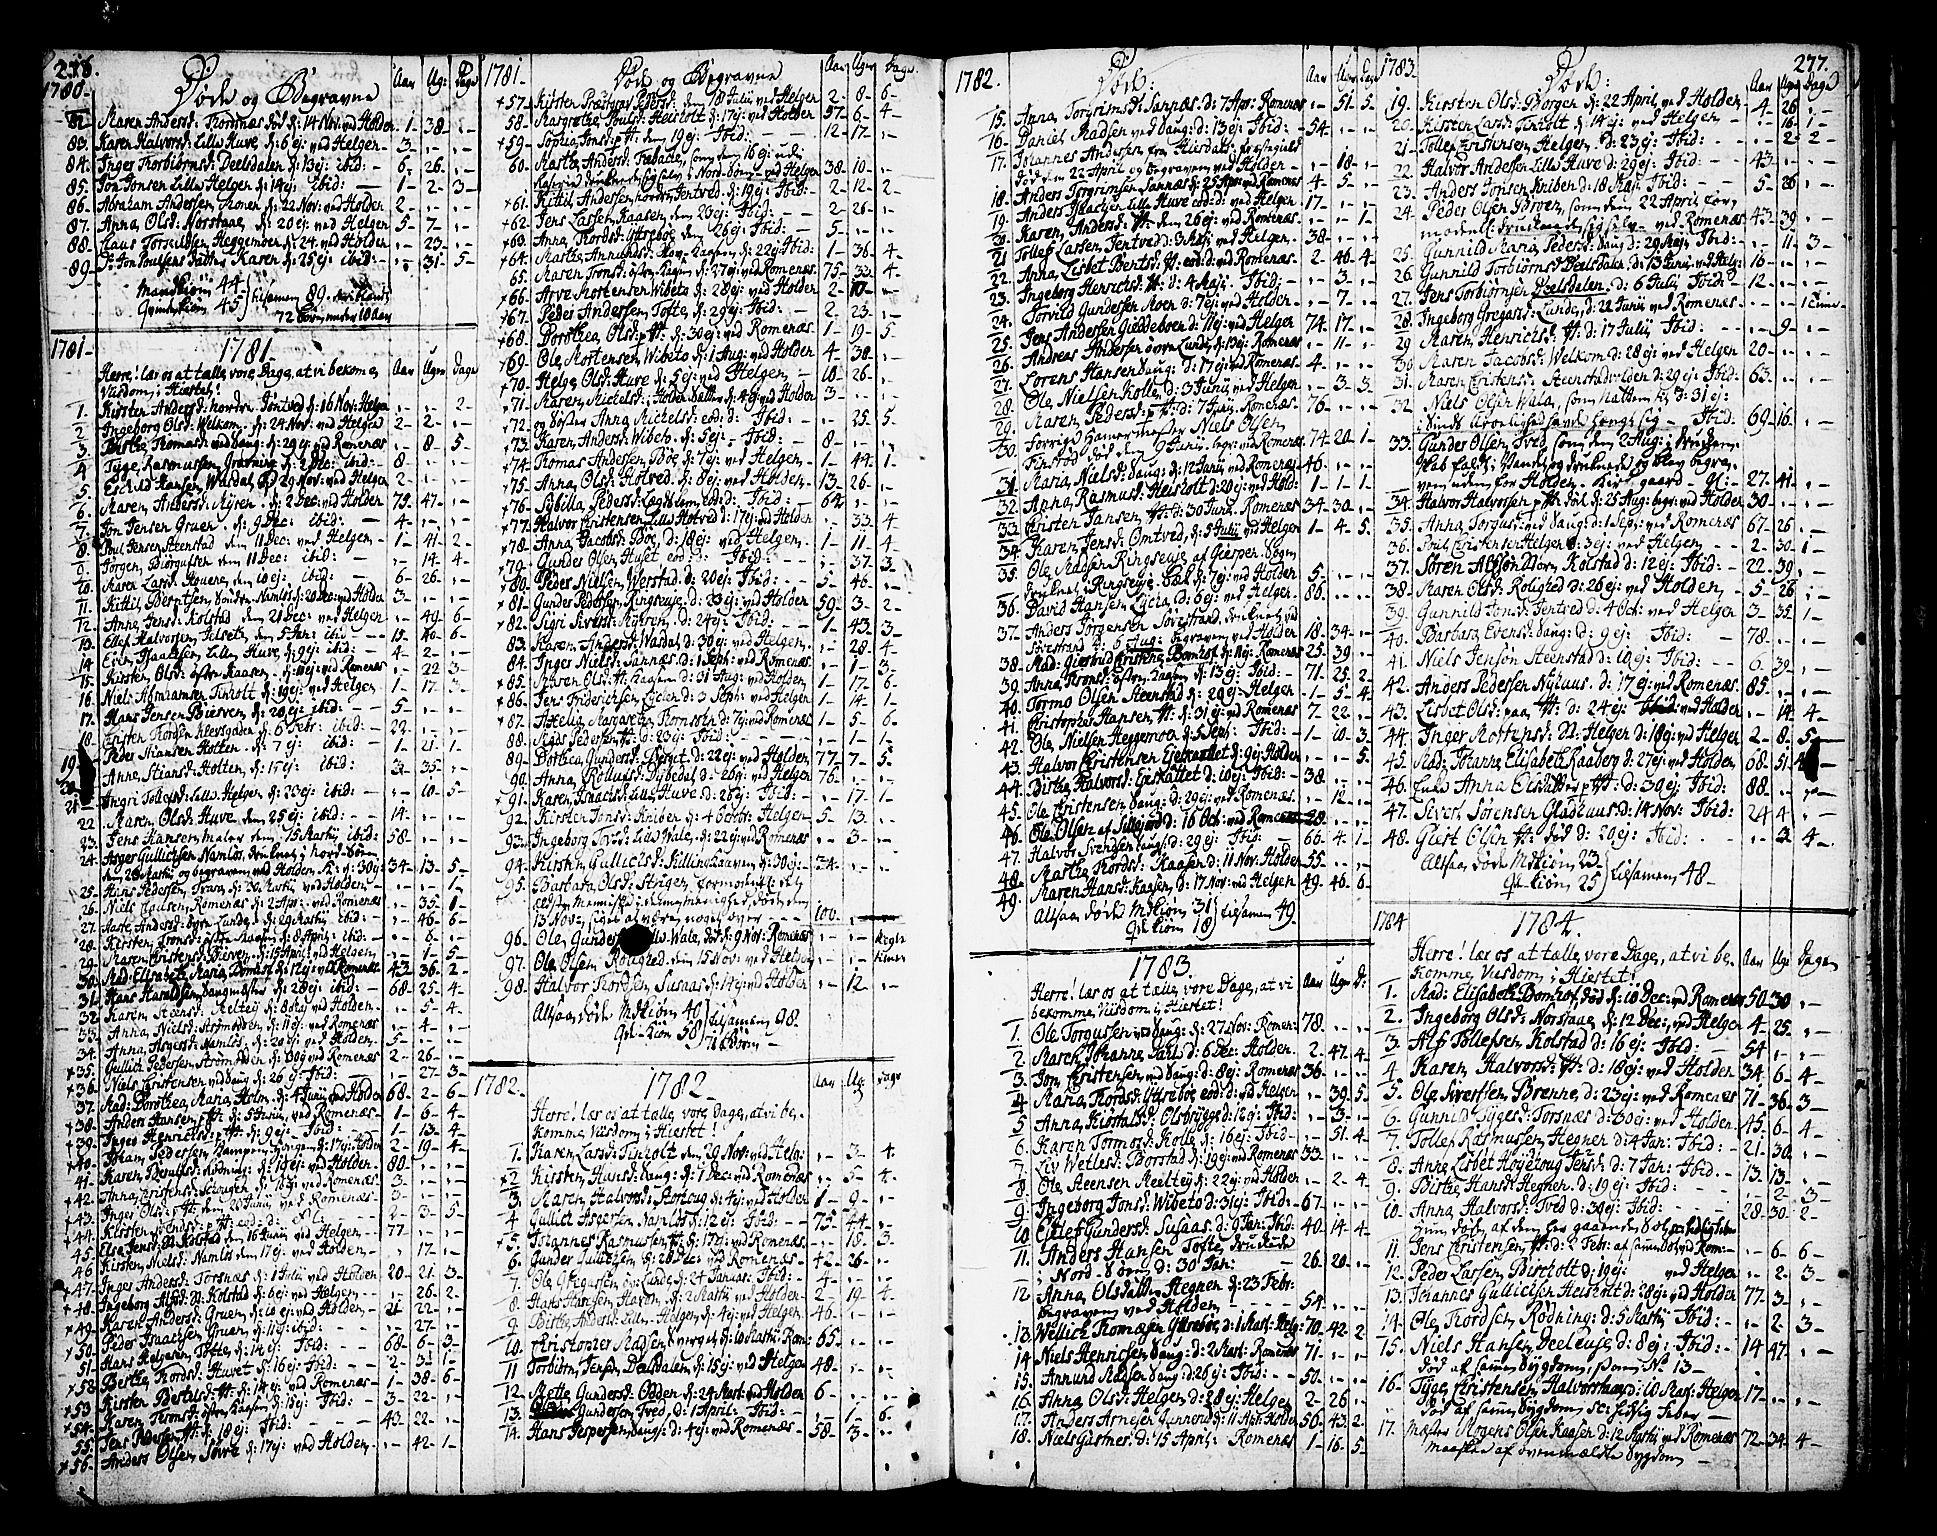 SAKO, Holla kirkebøker, F/Fa/L0002: Ministerialbok nr. 2, 1779-1814, s. 276-277